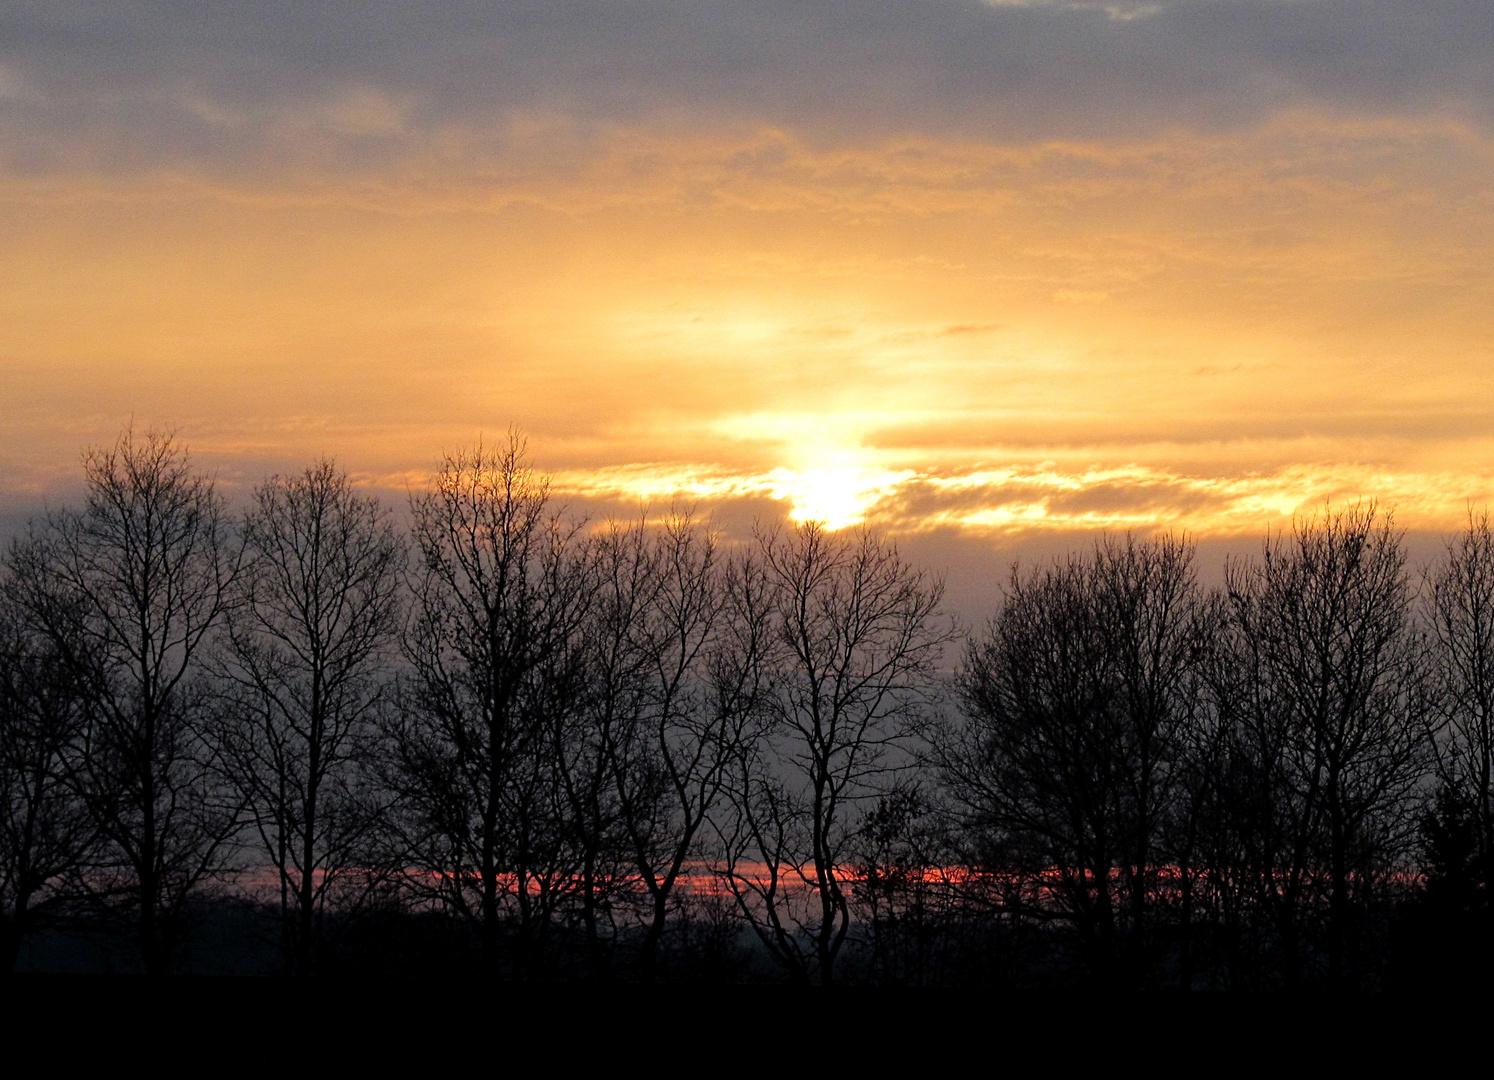 Sonnenuntergang über dem Basbecker Moor